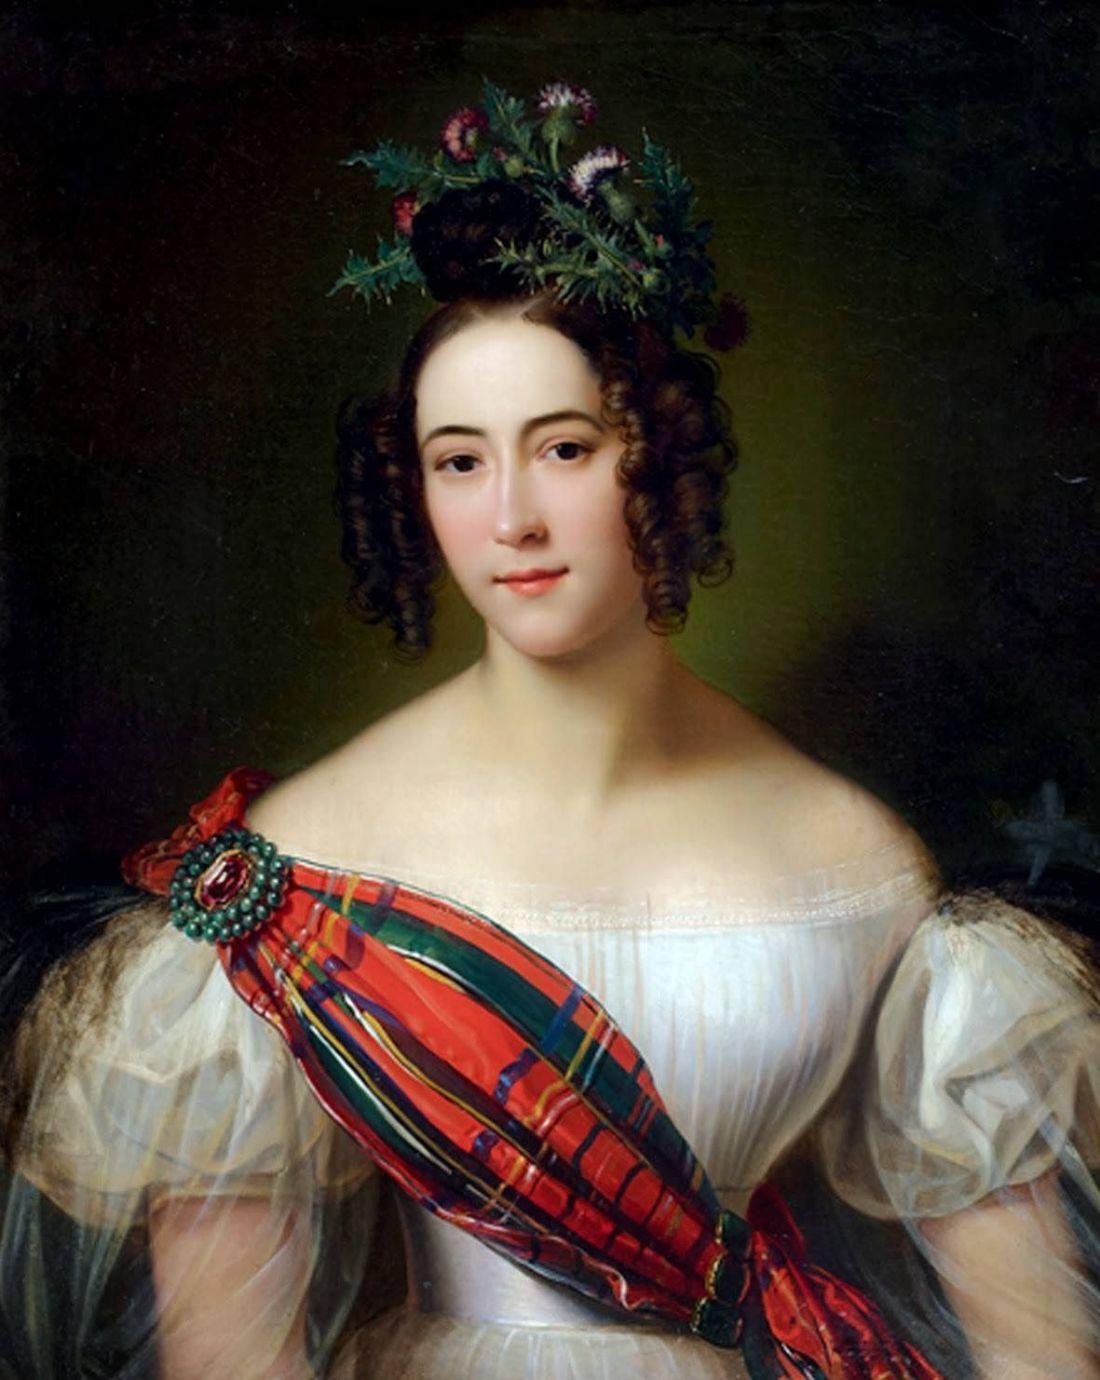 Portrait with a tartan sash, presumably of a Scottish lady. No date.